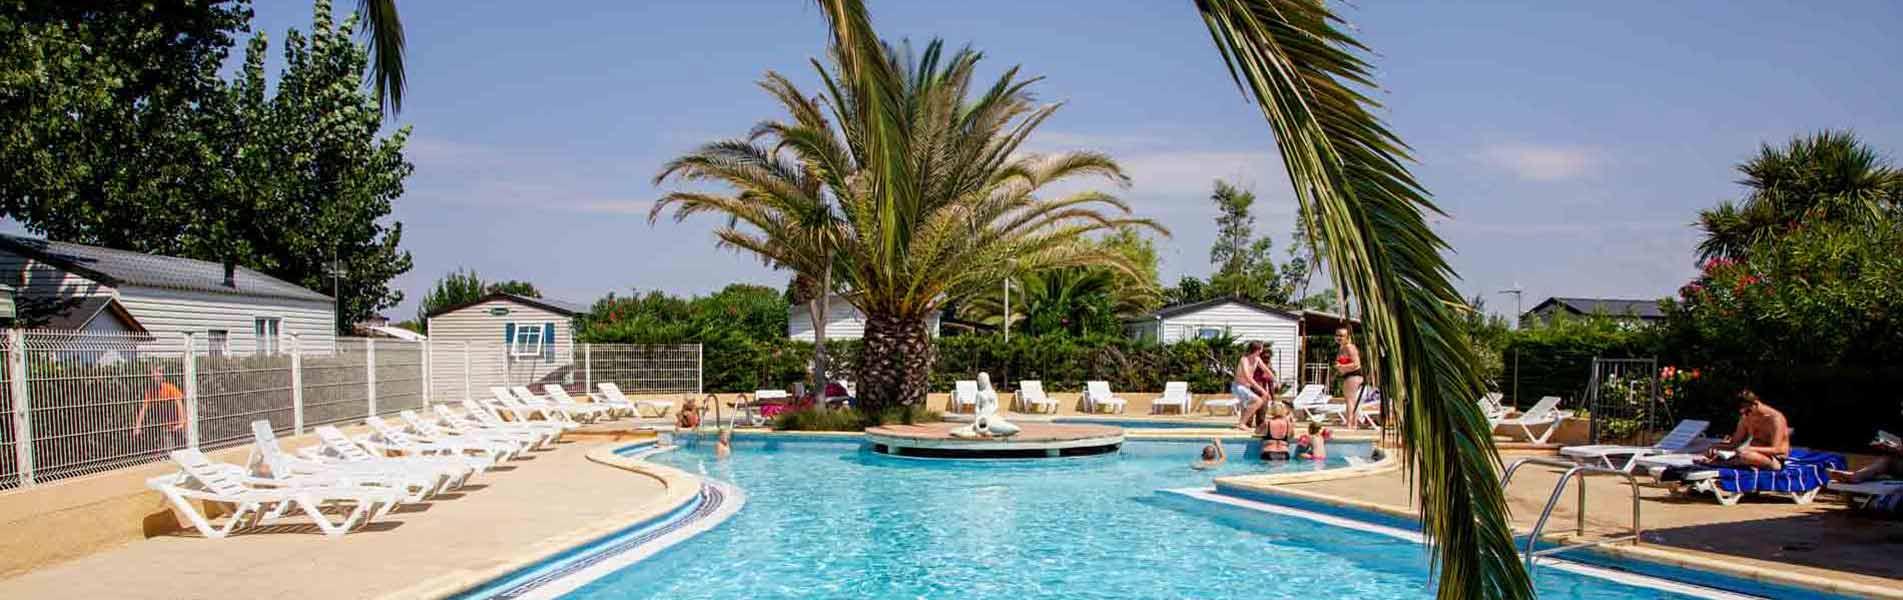 Camping piscine Hérault